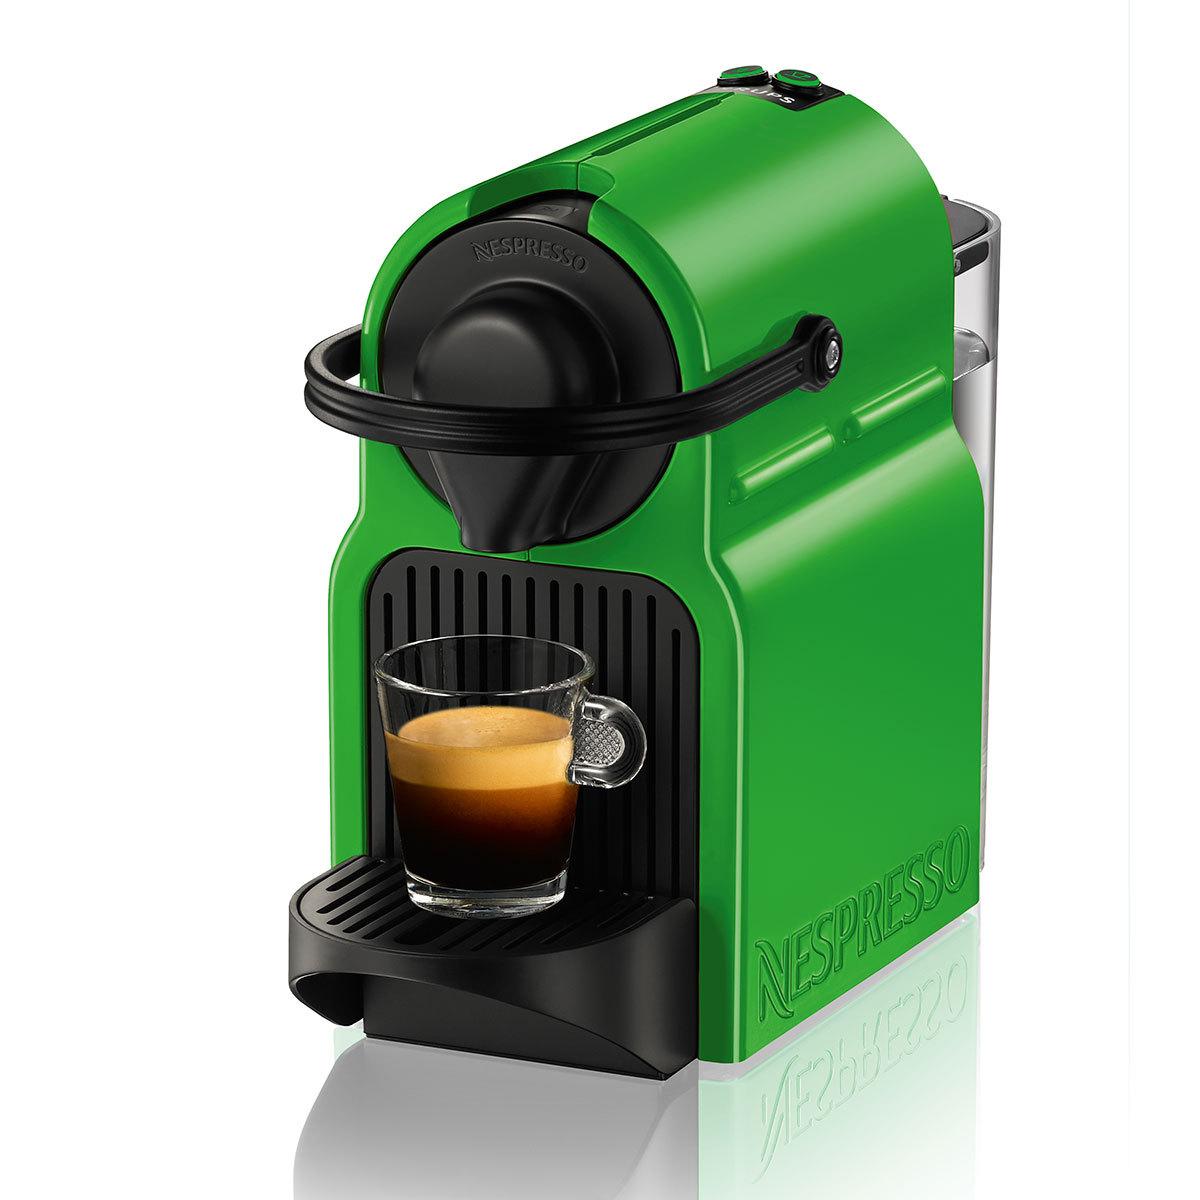 cafetiere nespresso verte